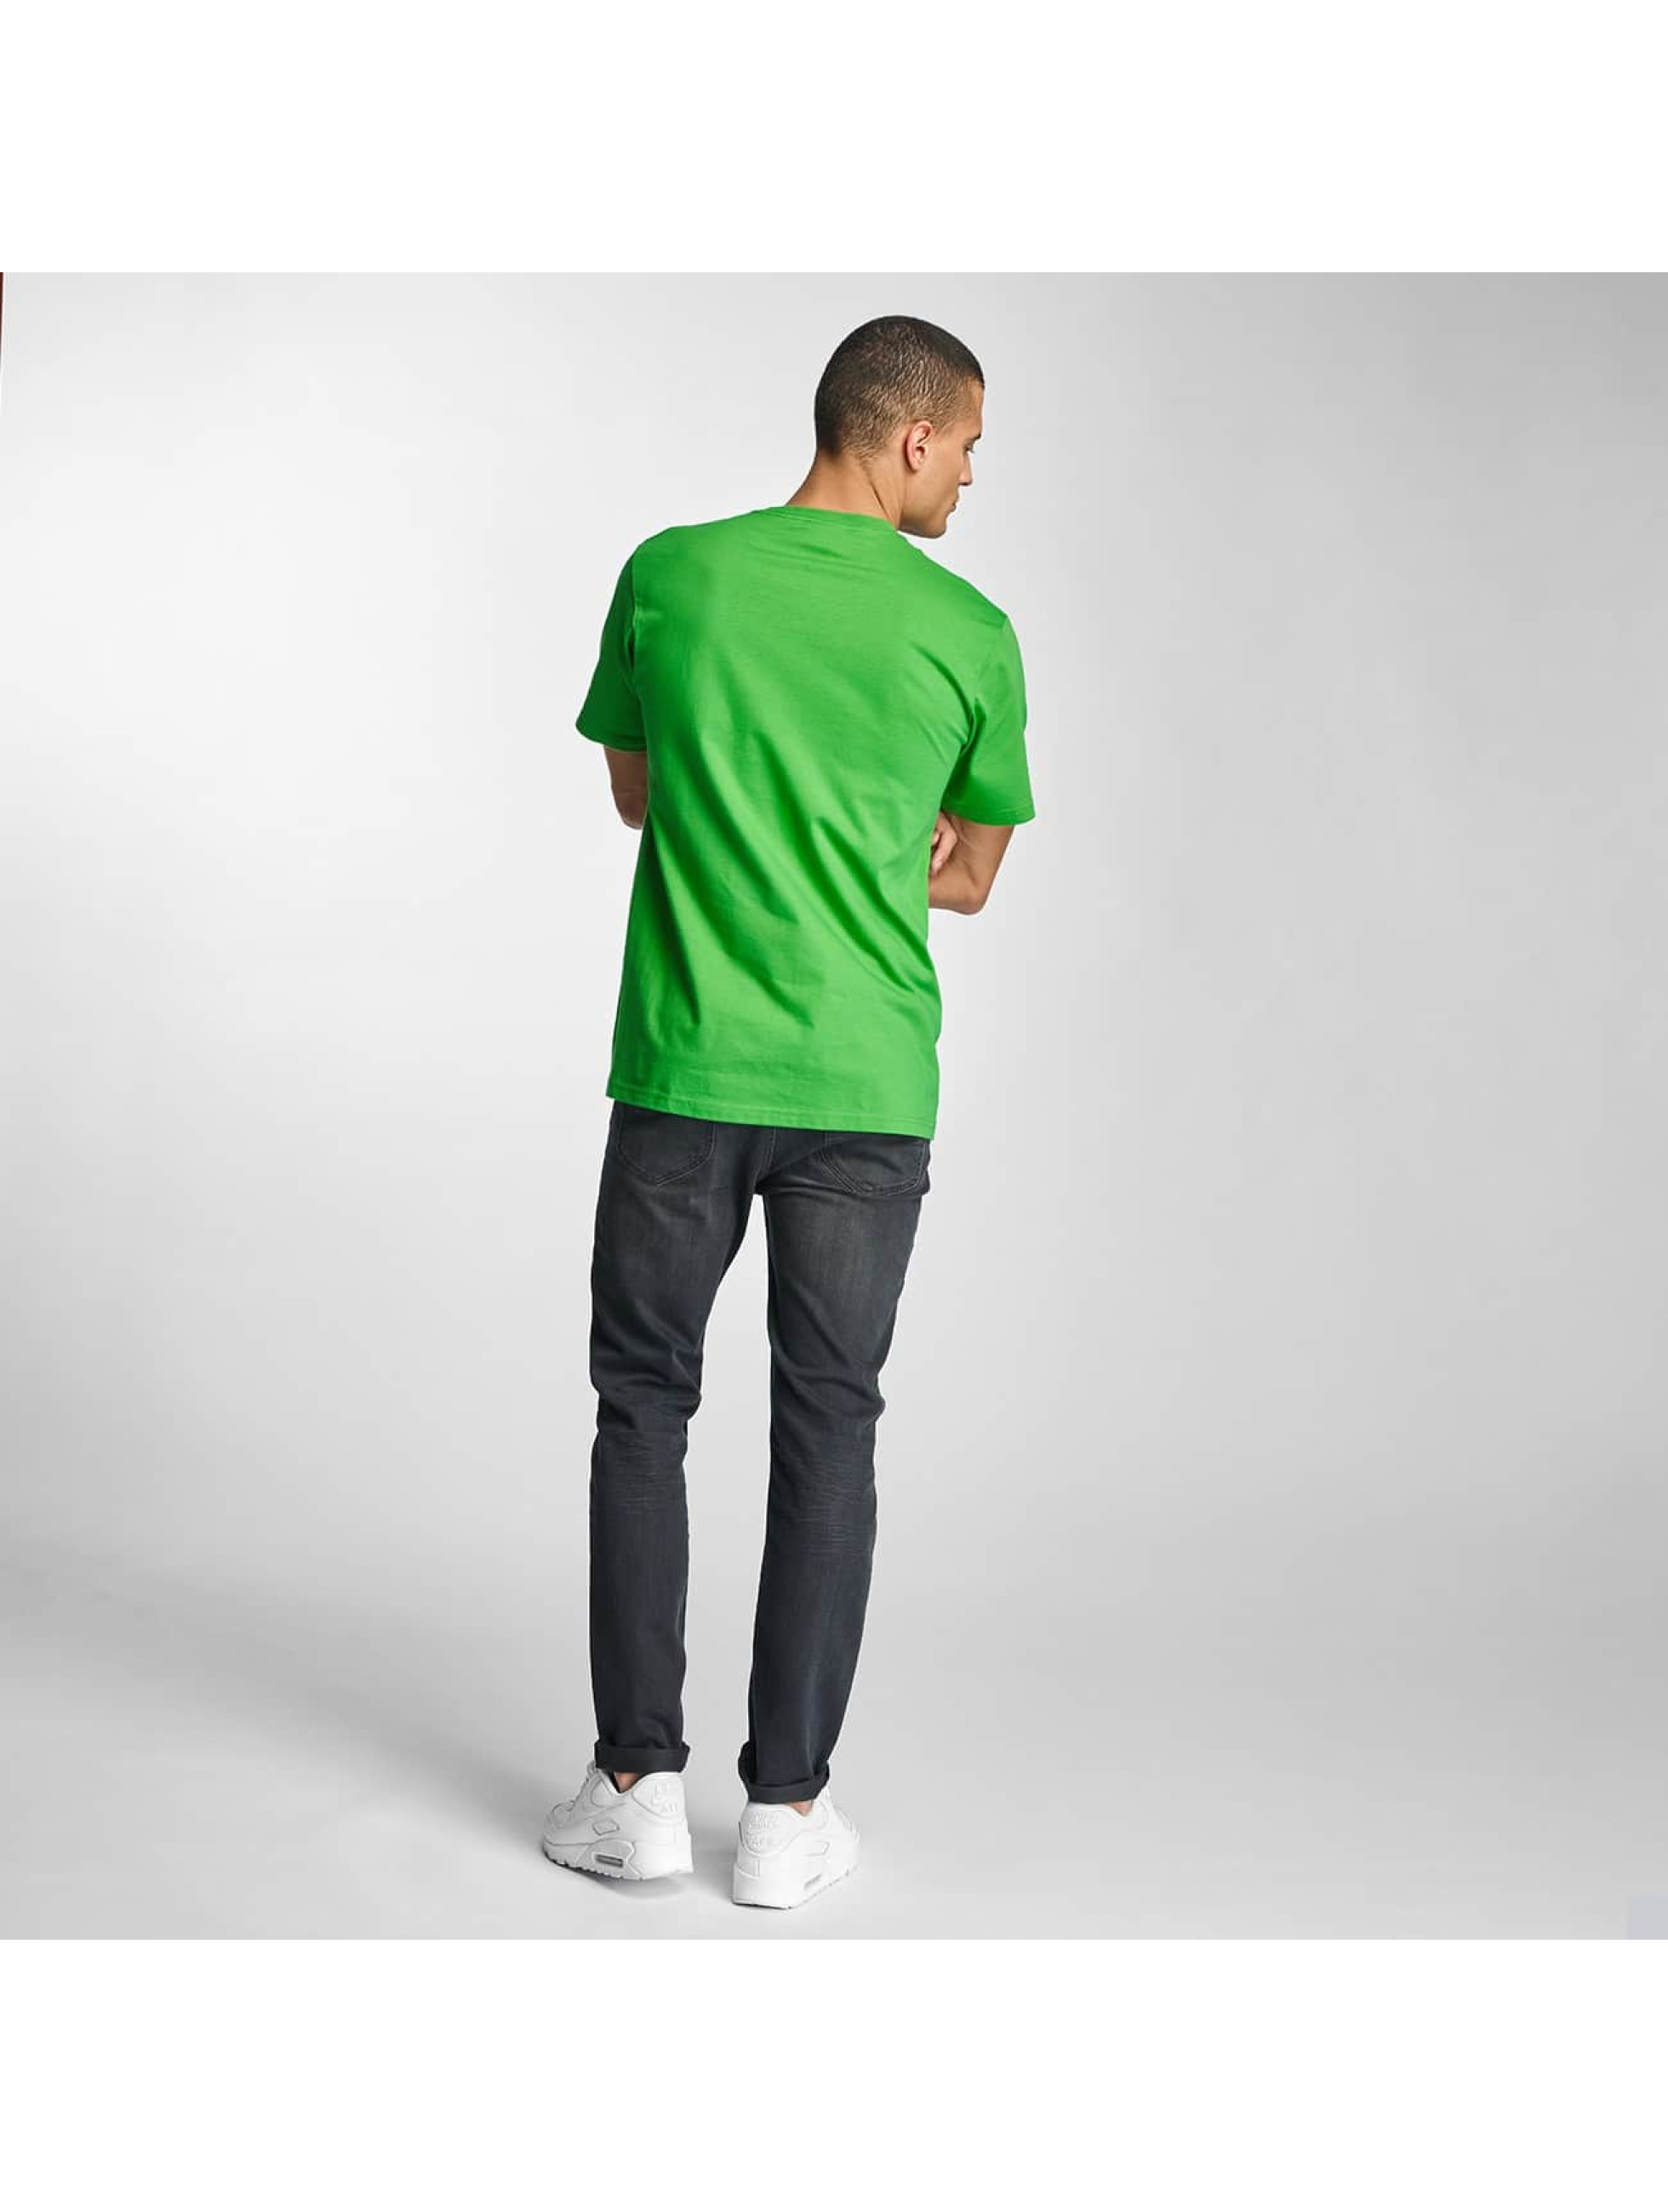 LRG T-Shirt Illusion green